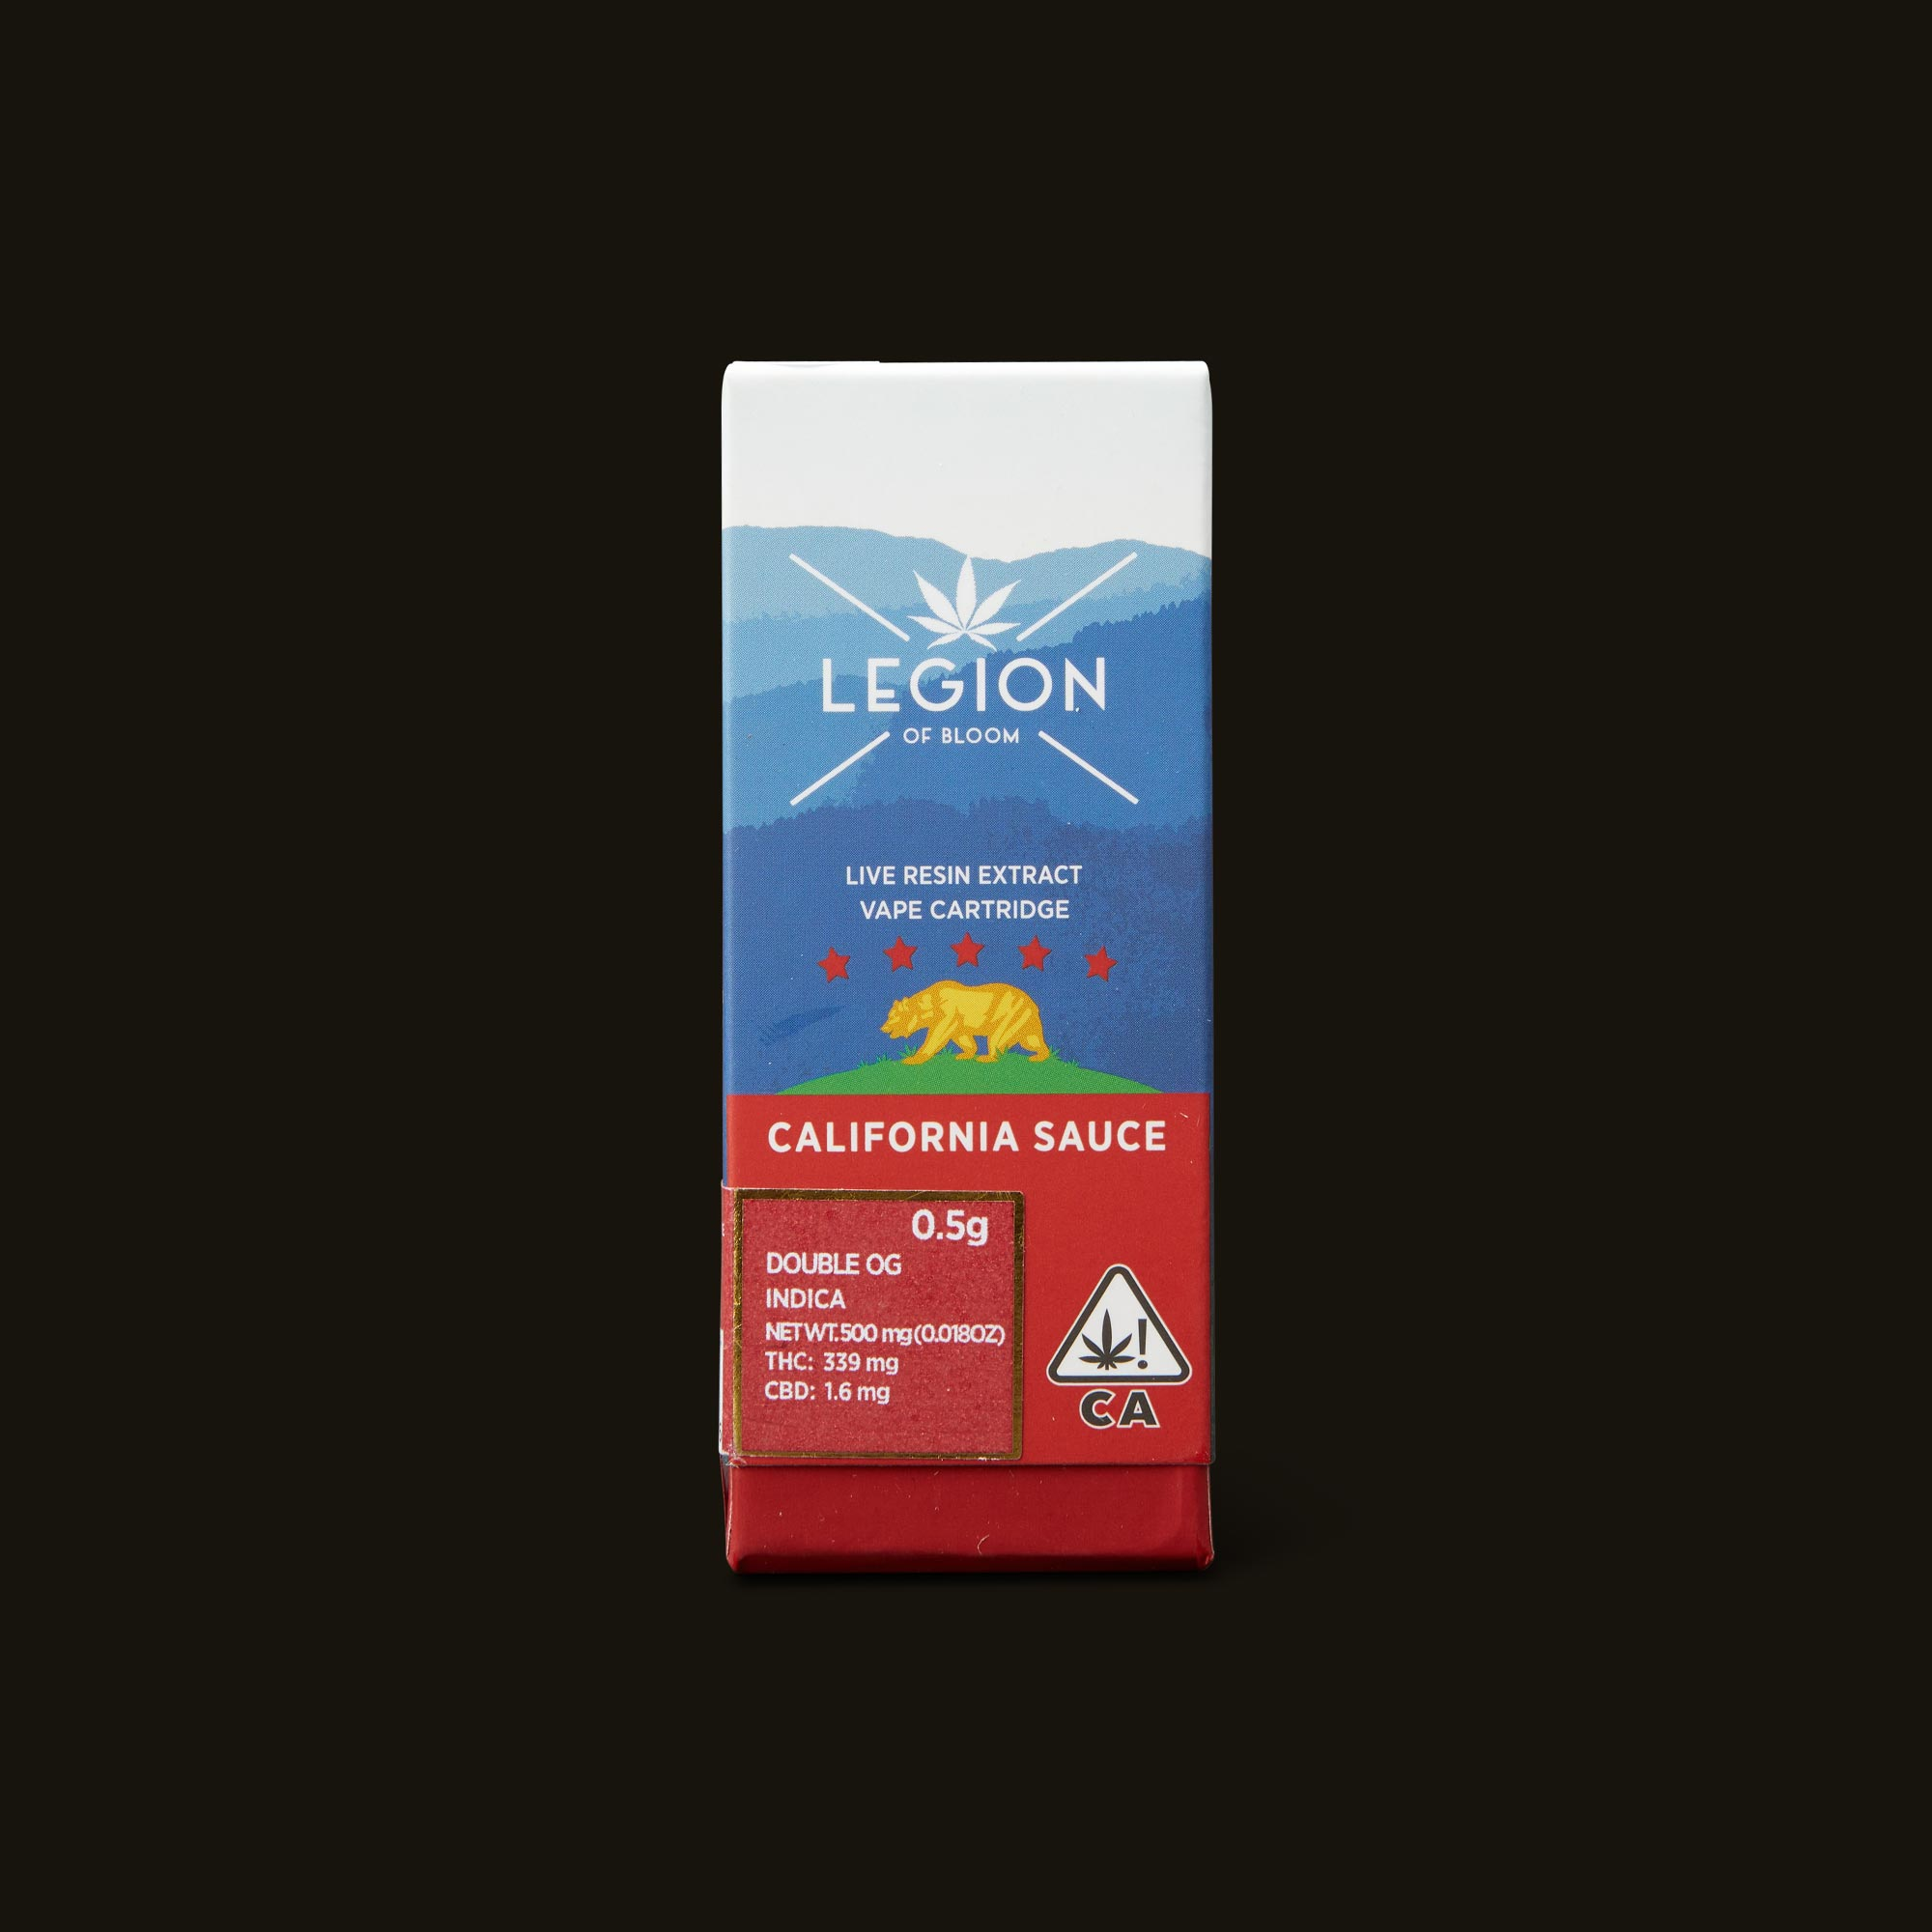 Legion of Bloom Double OG California Sauce Cartridge Front Packaging